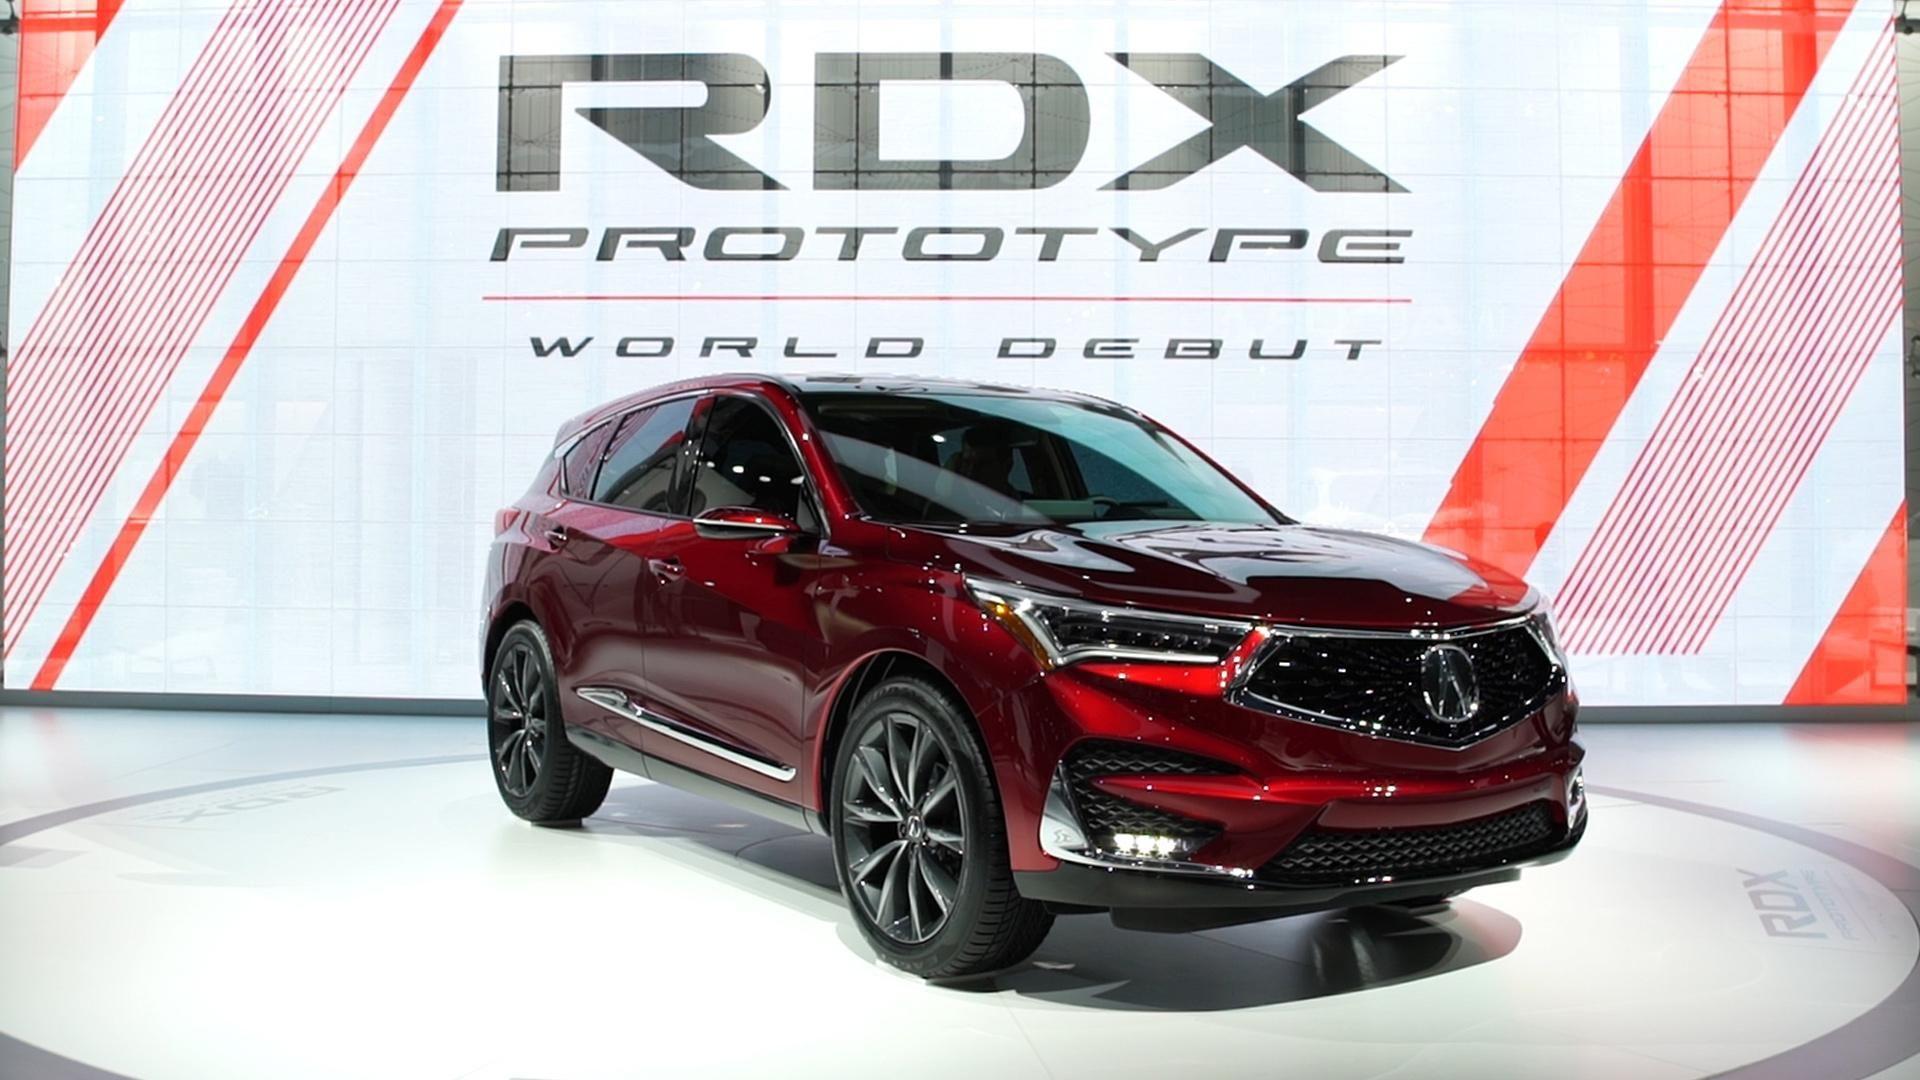 AllNew 2019 Acura RDX Gains Advanced Safety Systems